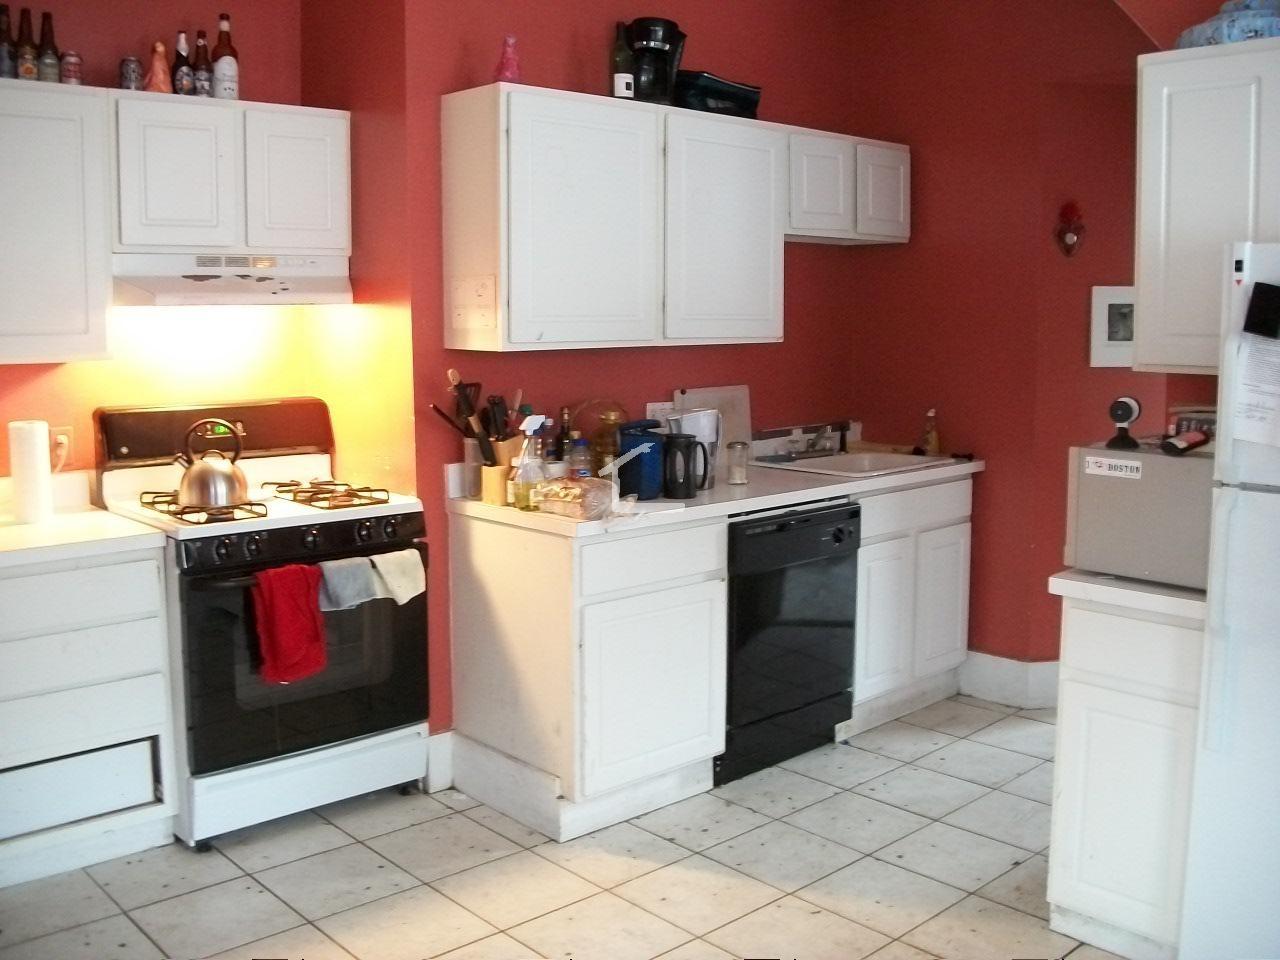 Greylock Rd 1 Boston Ma 02134 3 Bedroom Apartment For